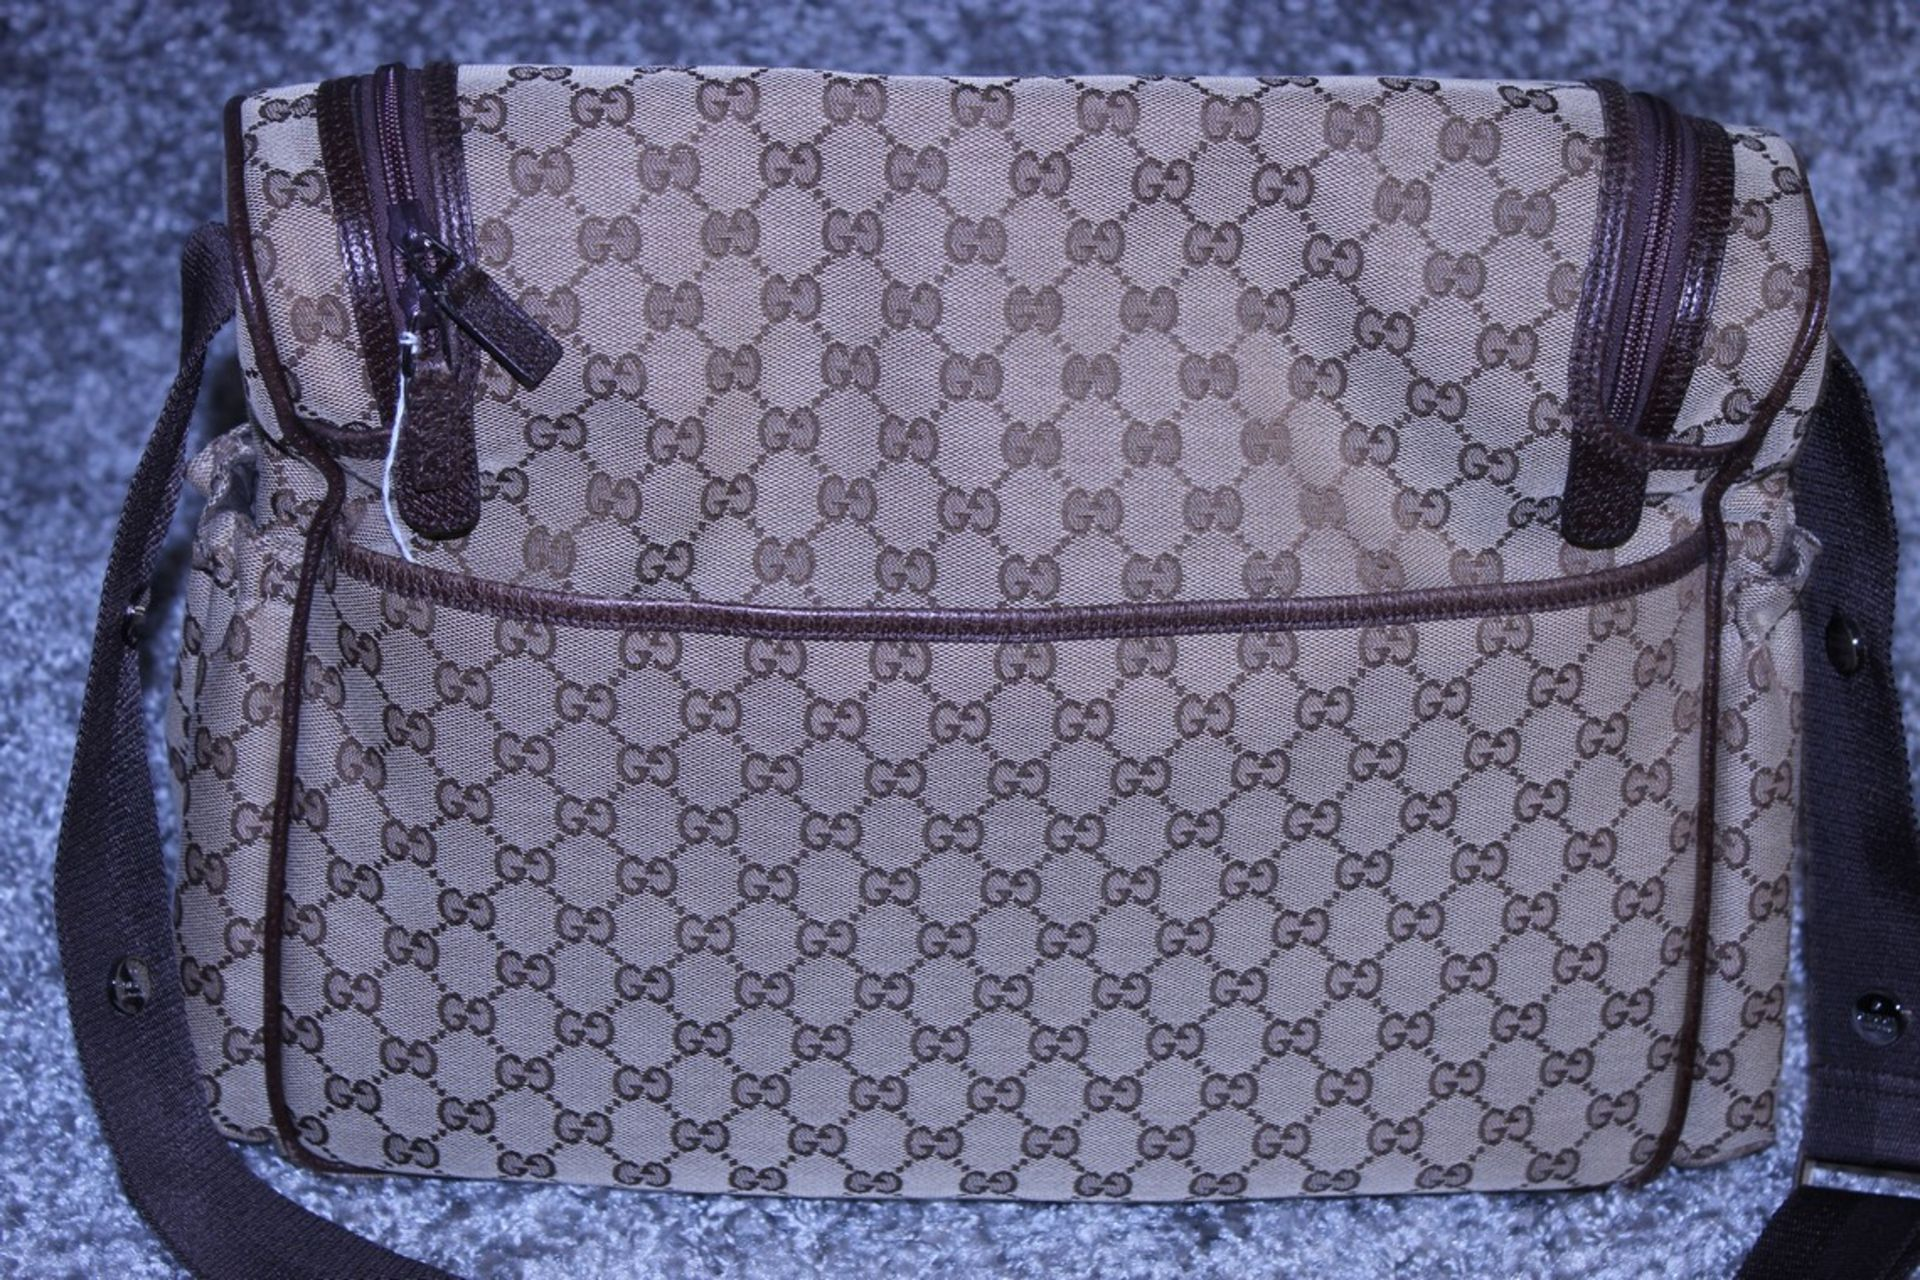 RRP £1,200 Gucci Original Diaper Bag, Beige/Dark Brown Monogramme Canvas, 36X28X12Cm (Production - Image 2 of 5